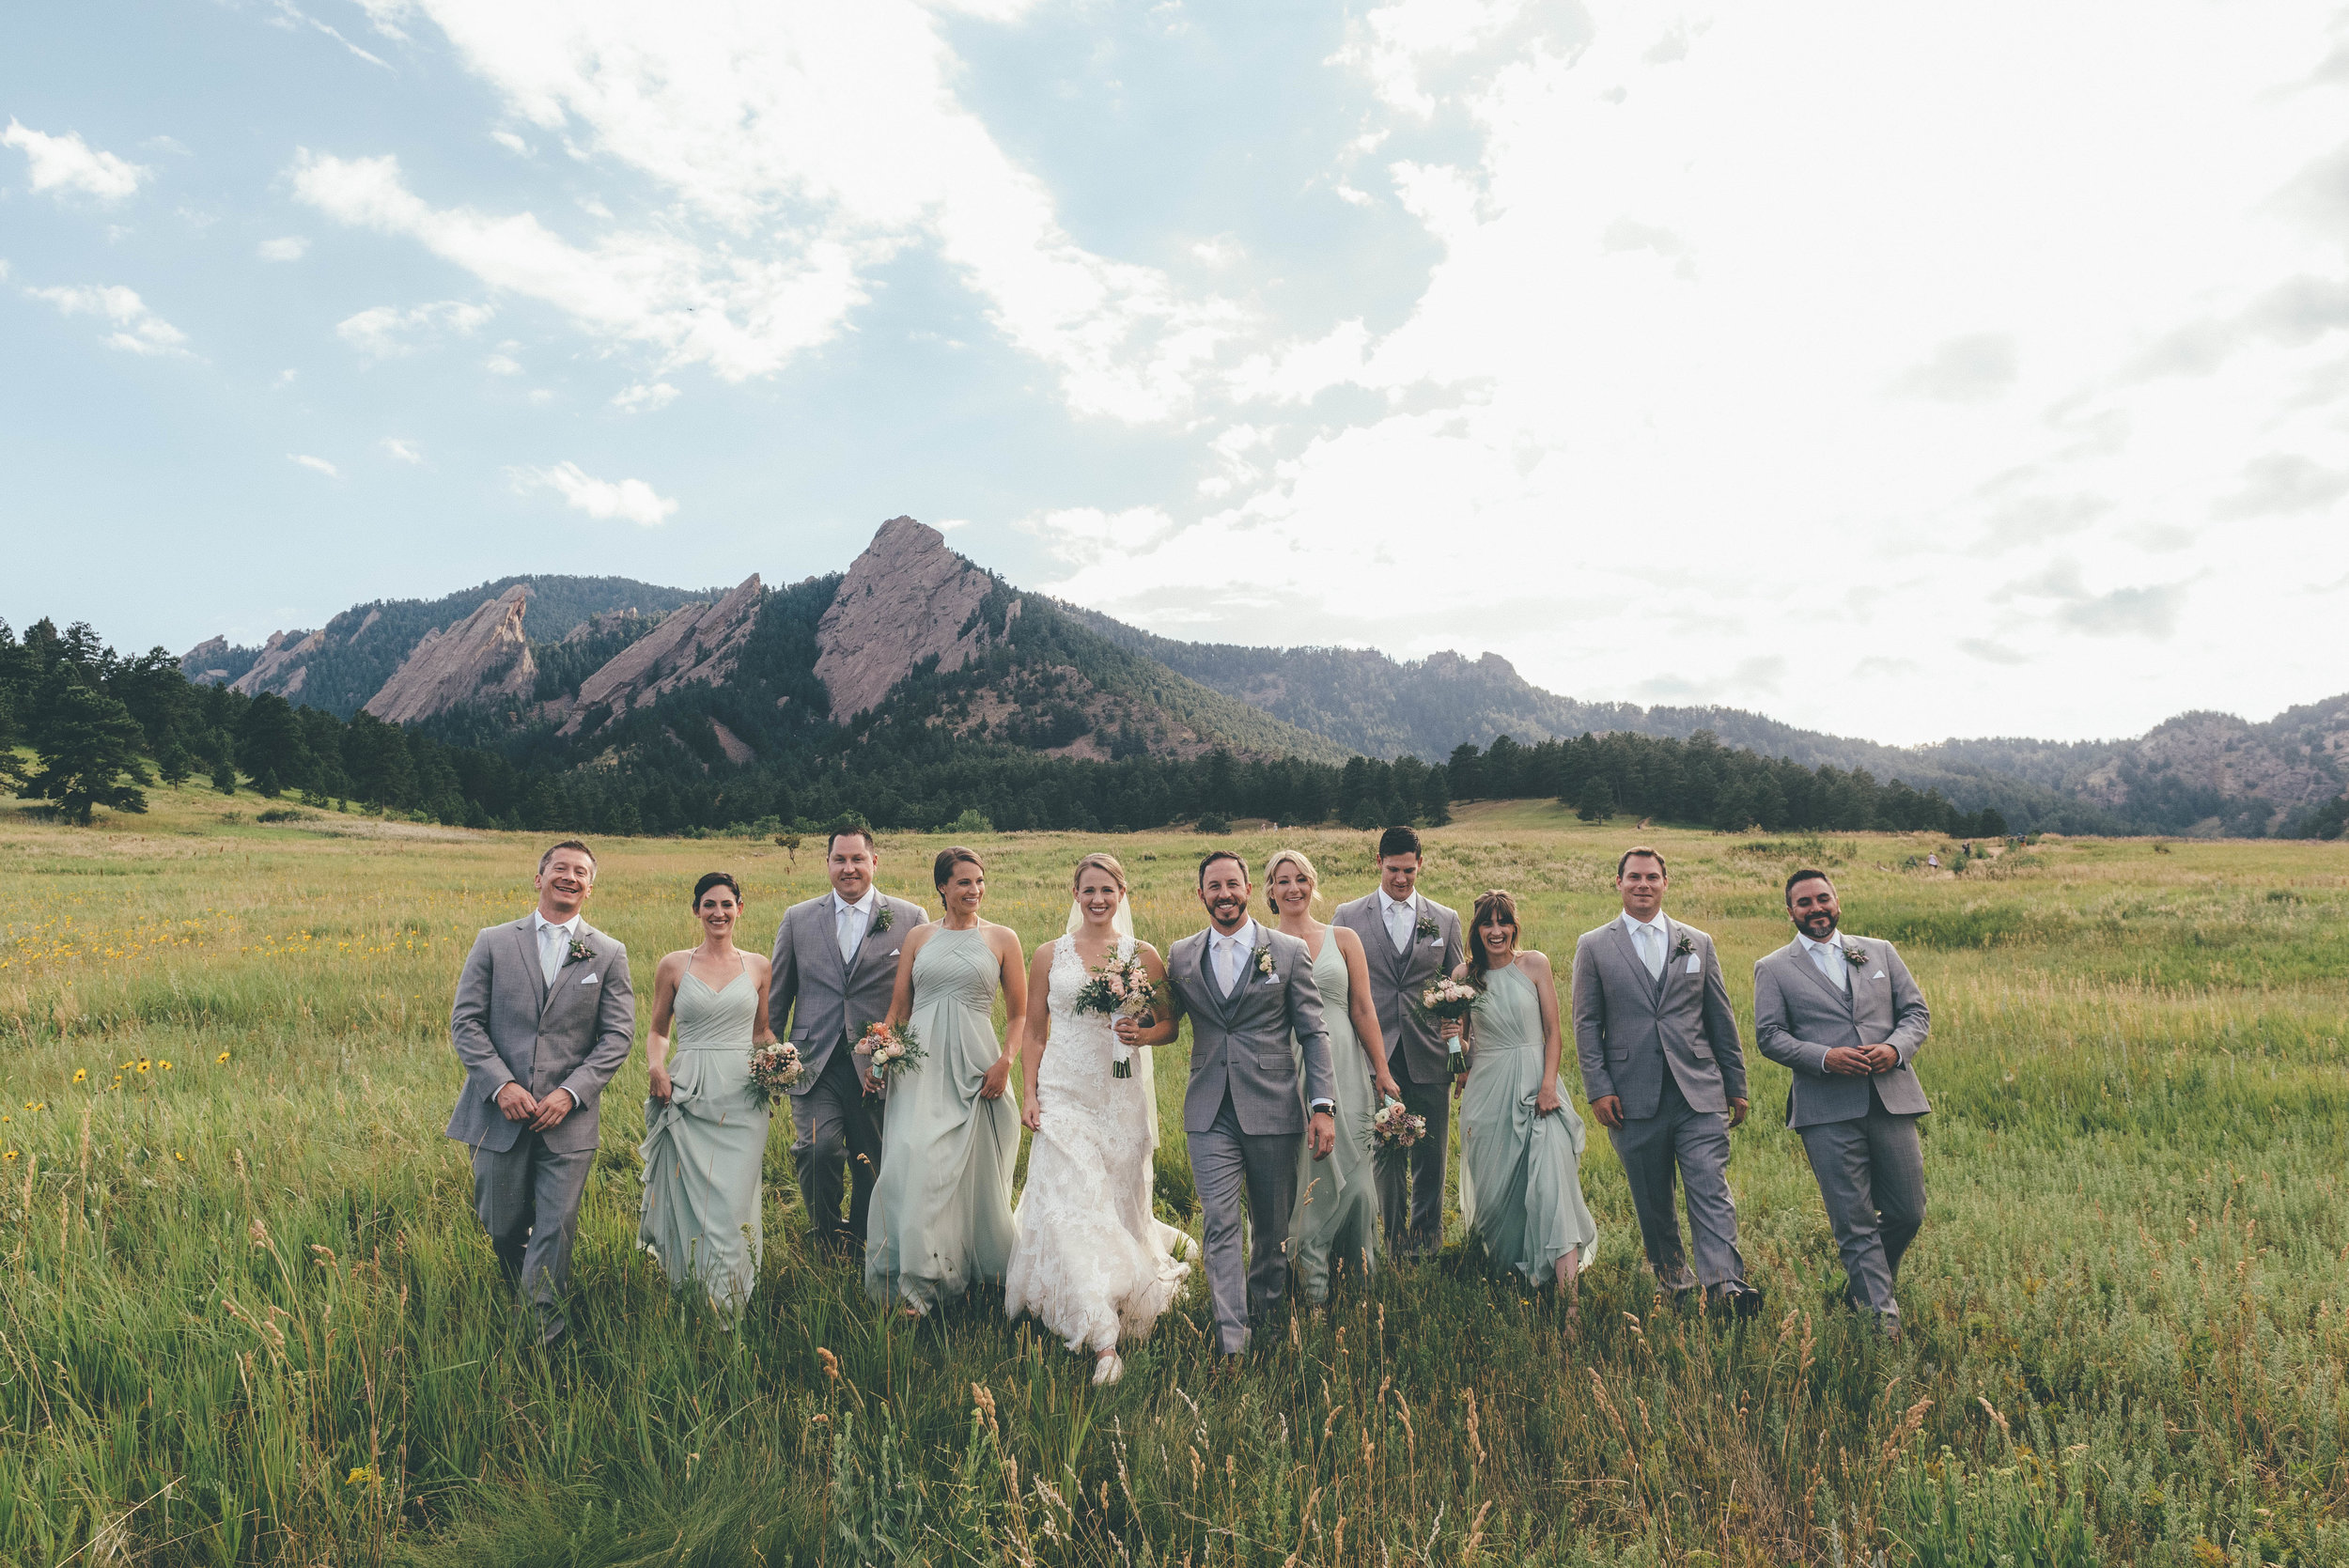 ChadFahnestockPhotography-mc-wedding-016.jpg